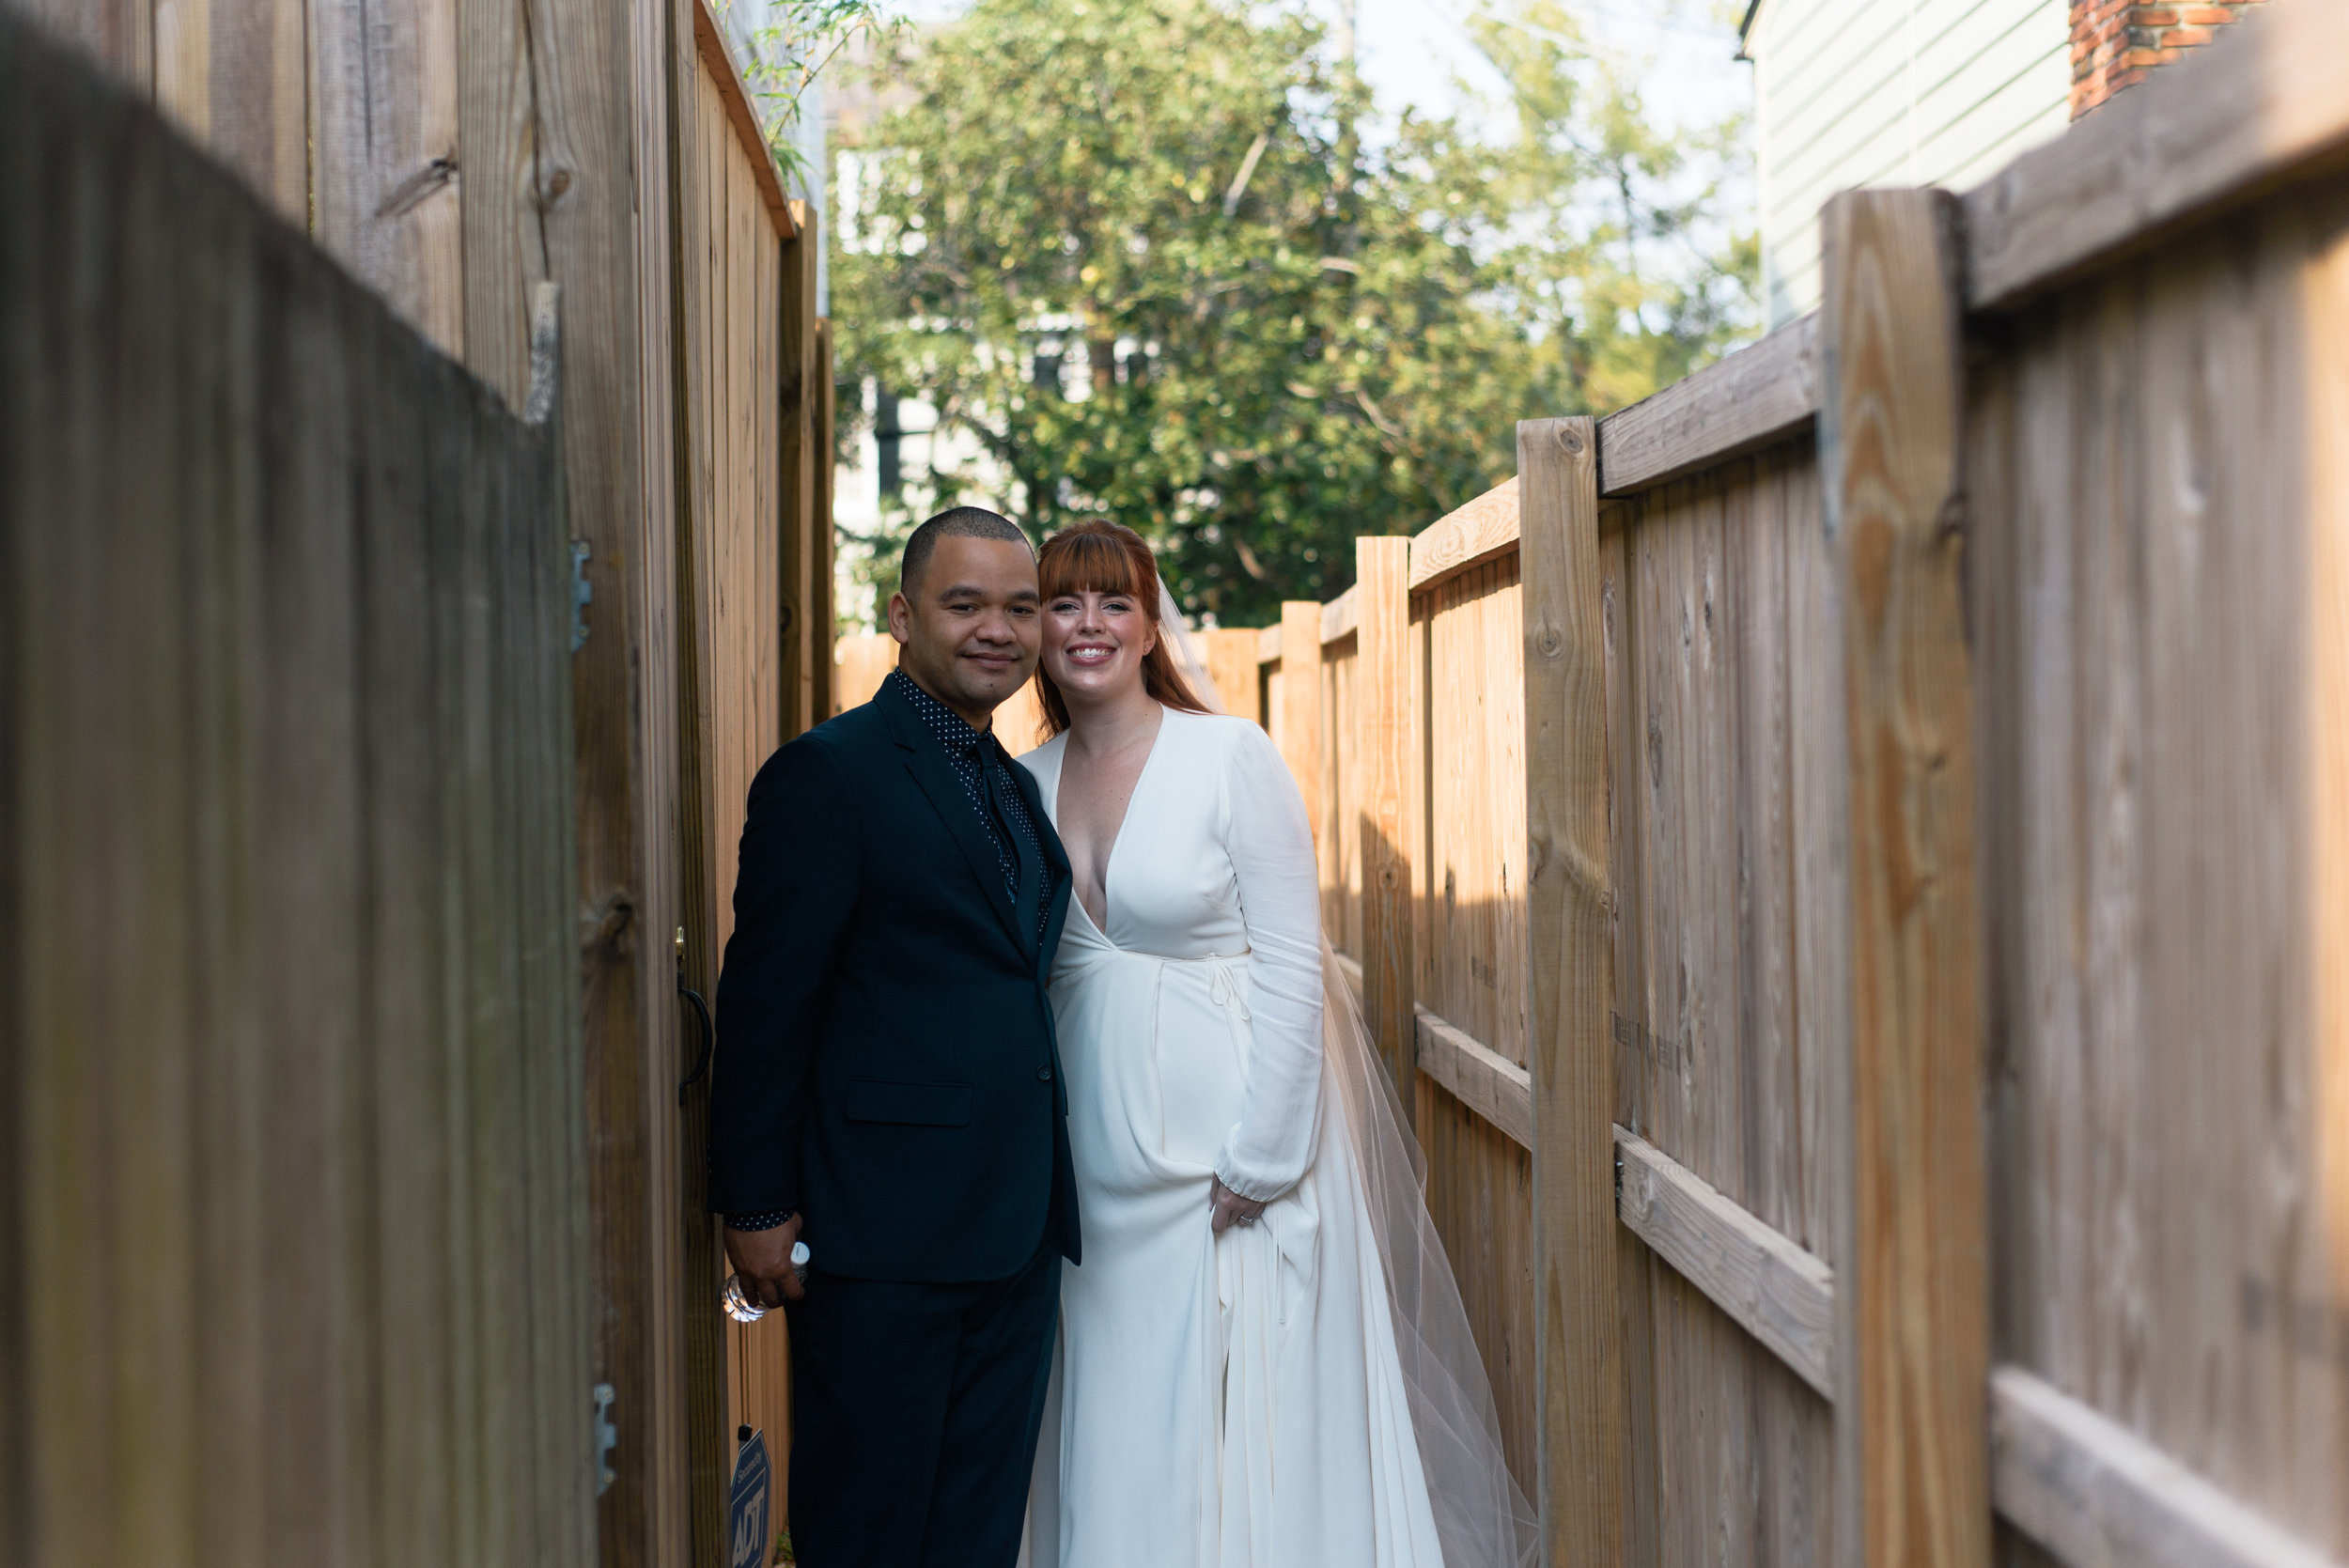 savannah-elopement-photography-savannah-georgia-elopement-photographer-savannah-wedding-photographer-meg-hill-photo-jade-hill- (17 of 58).jpg